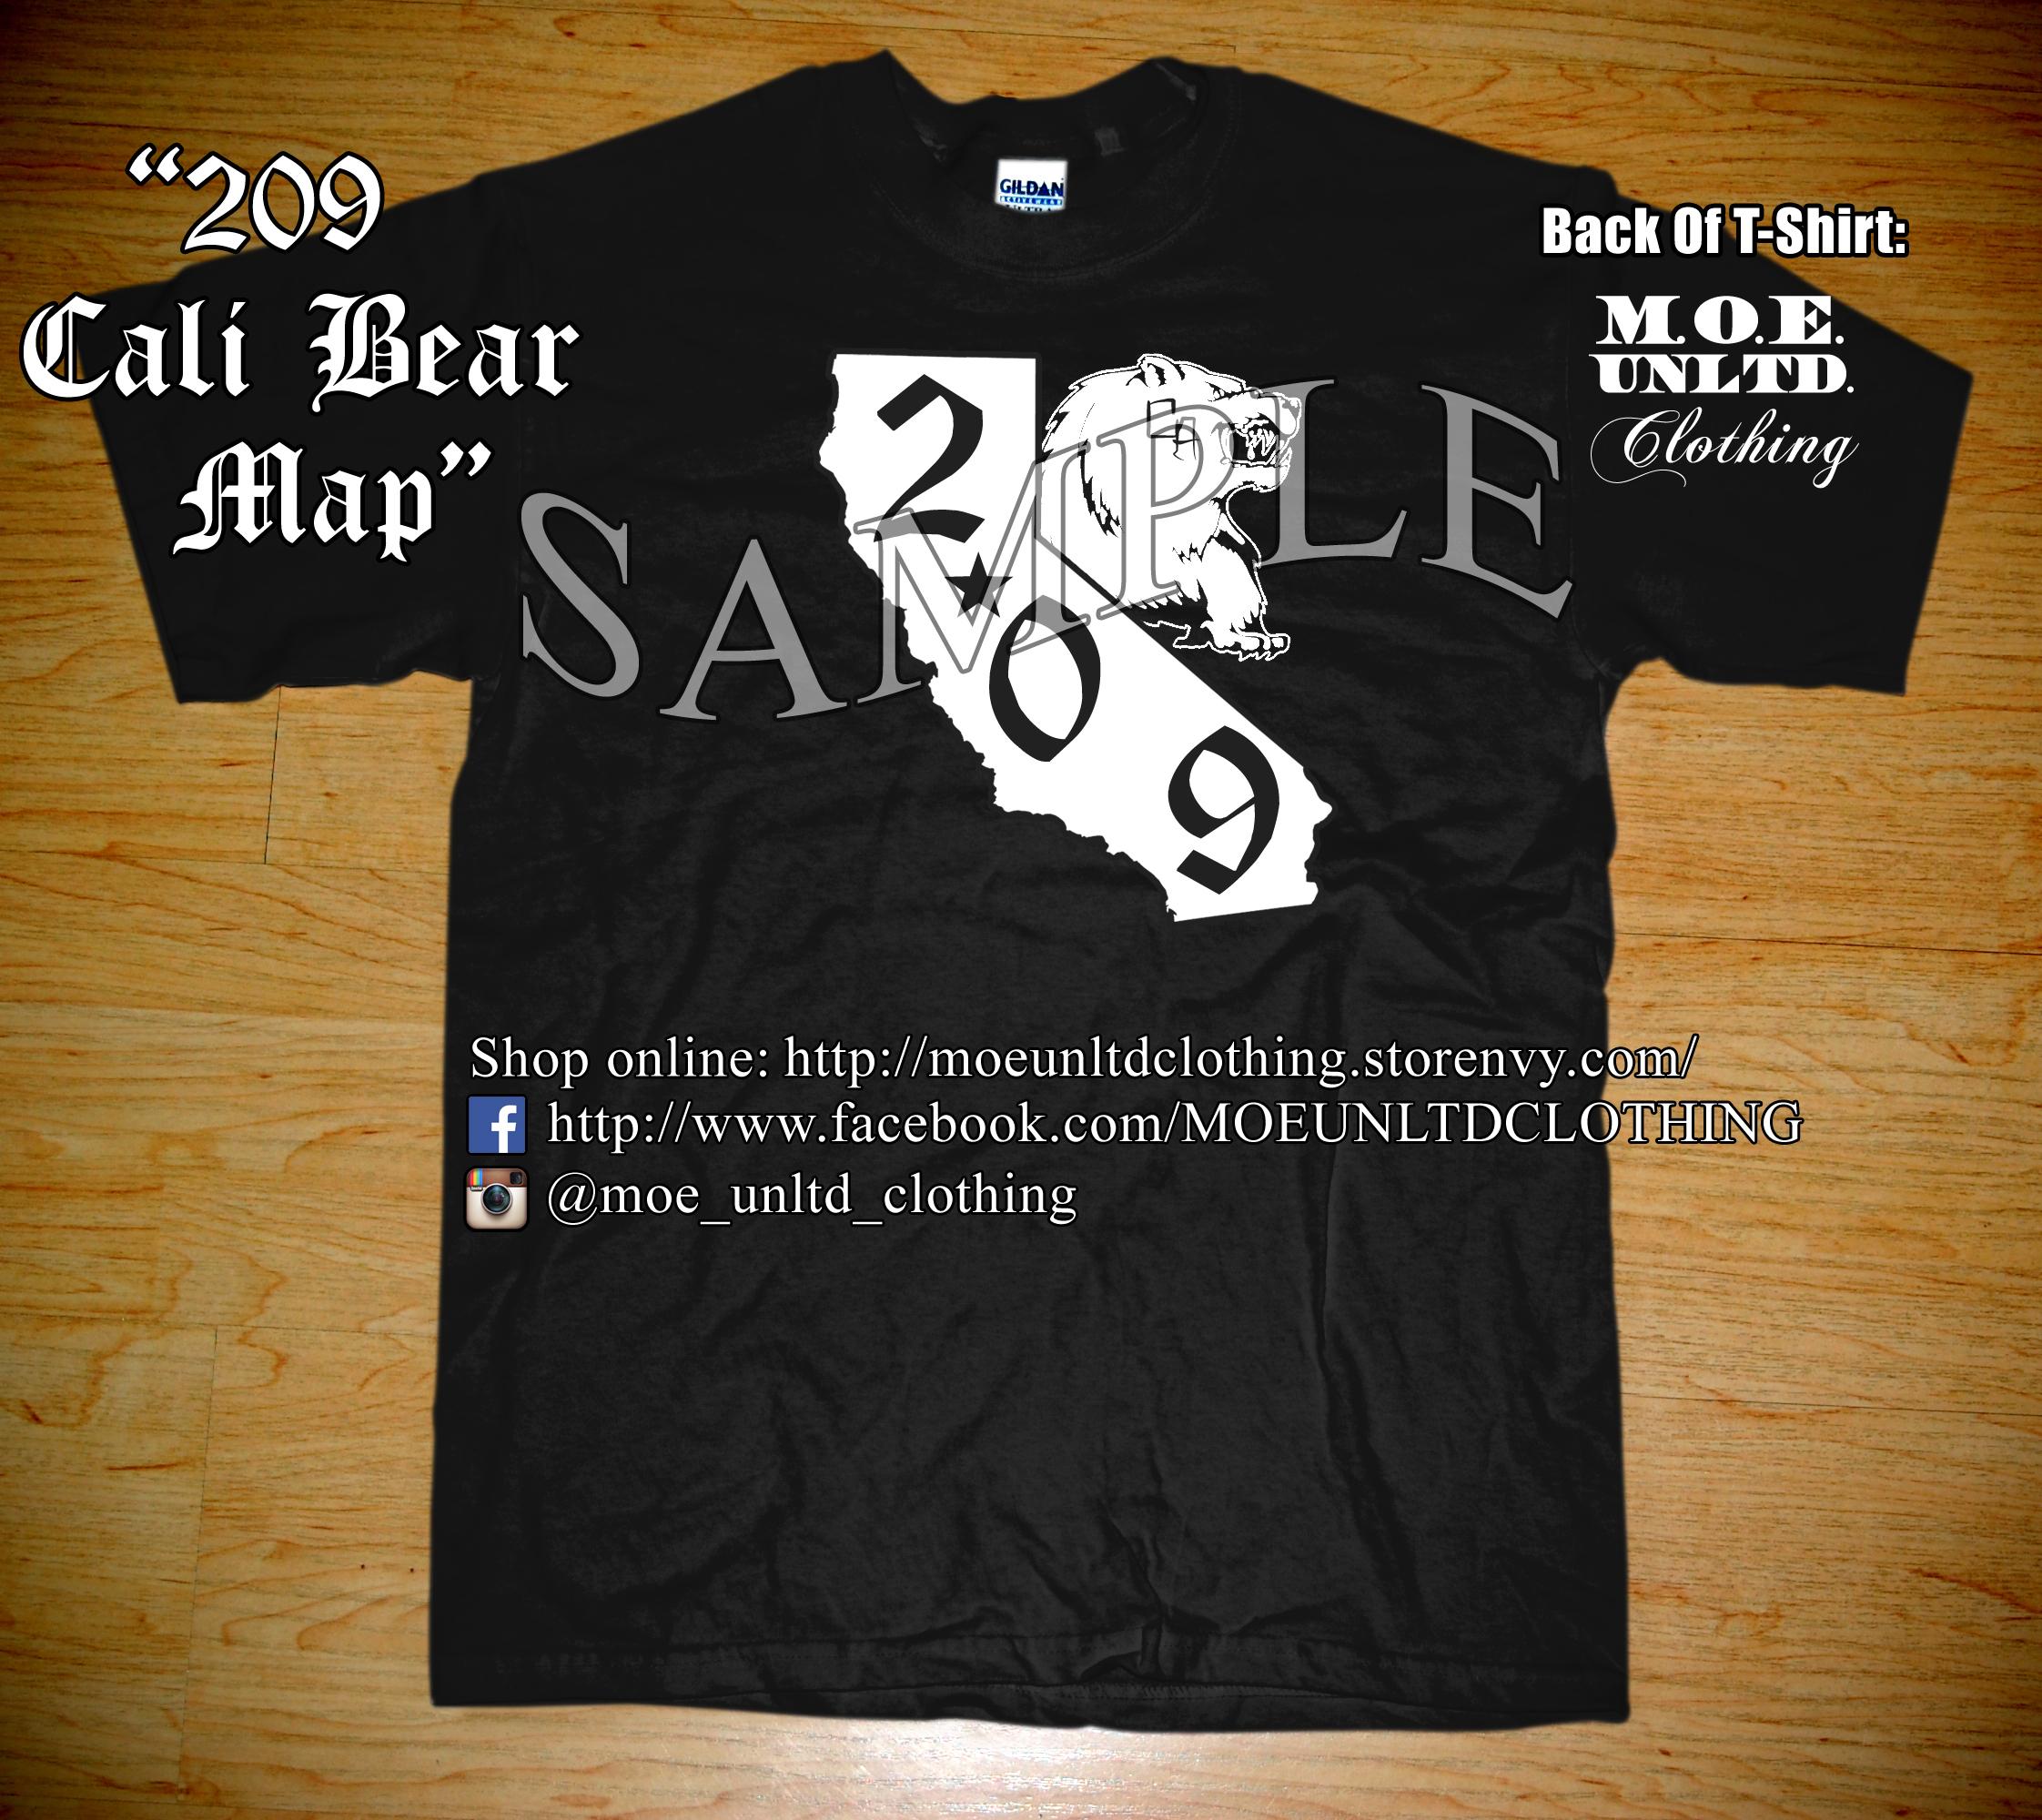 M.o.e. Unltd. Clothing   209 Cali Bear Map Men's T-Shirt   Online - California Map Shirt